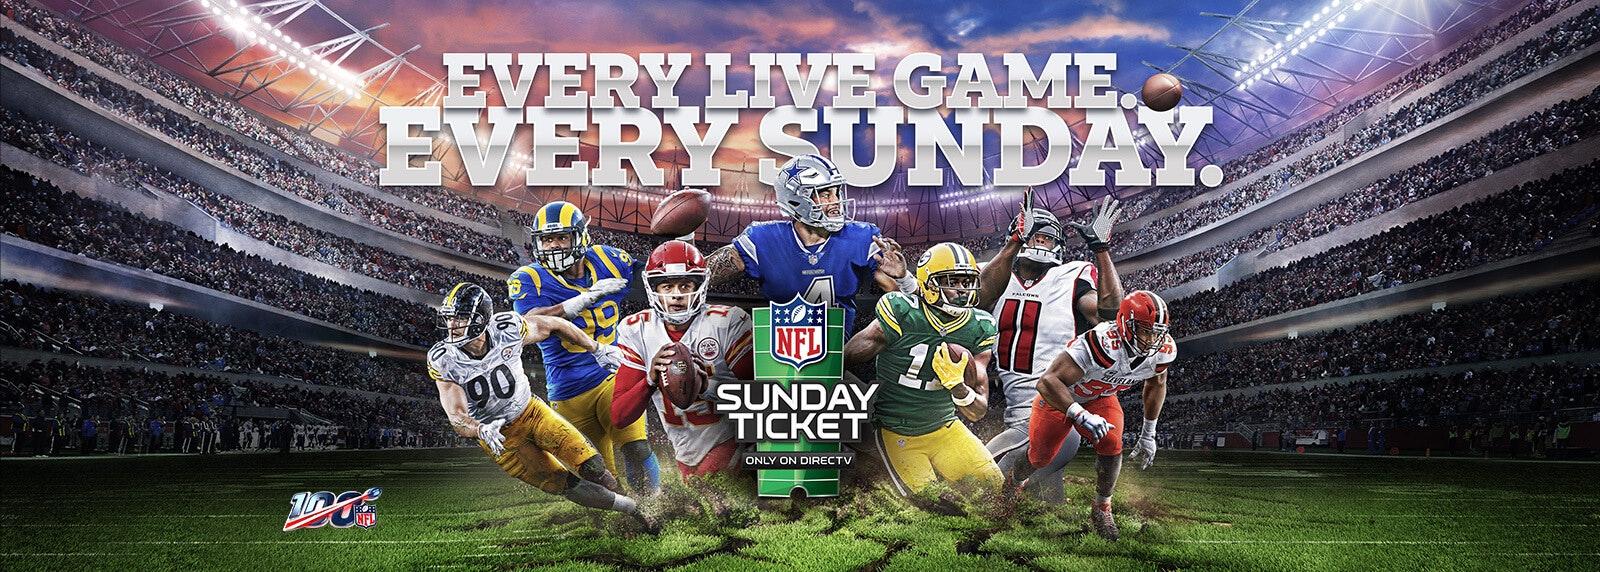 watch giants vs vikings live stream on nfl sunday ticket